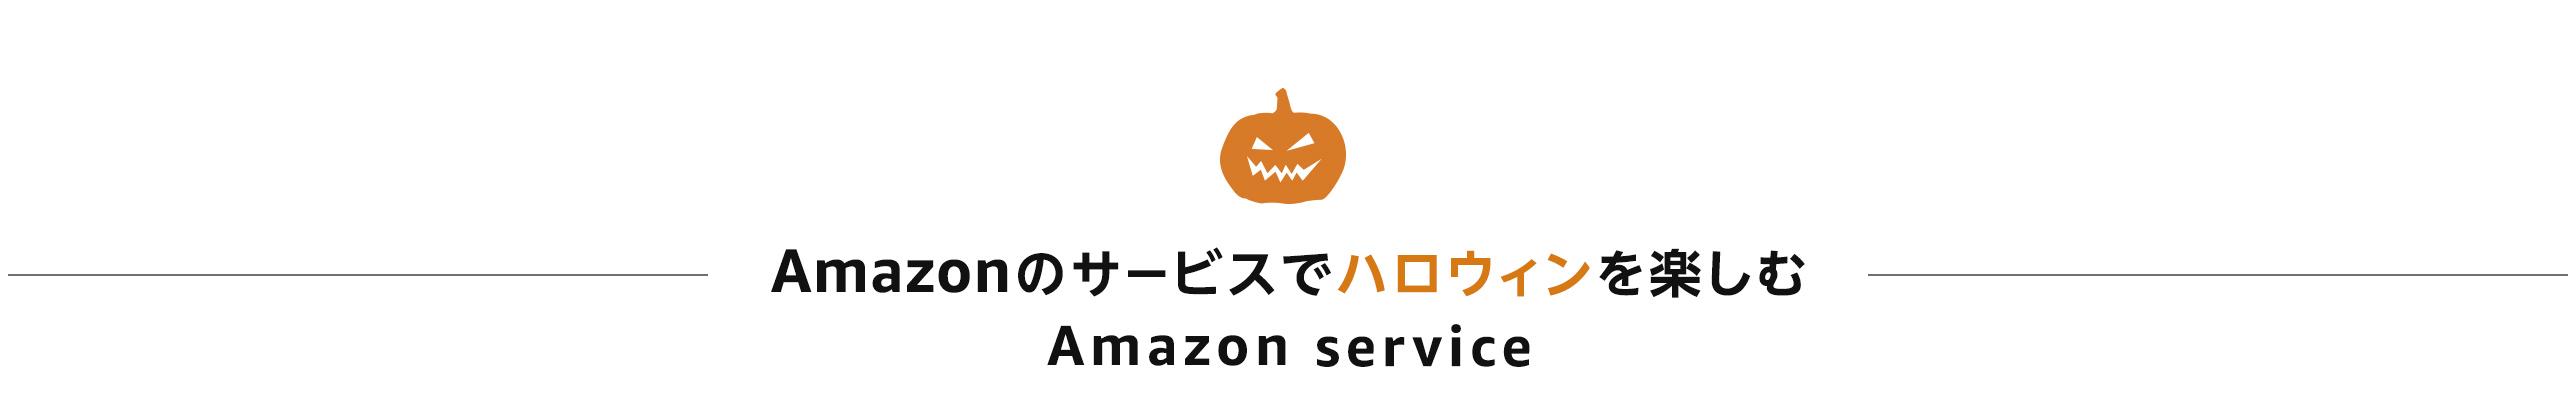 Amazonのサービスでハロウィンを楽しむ